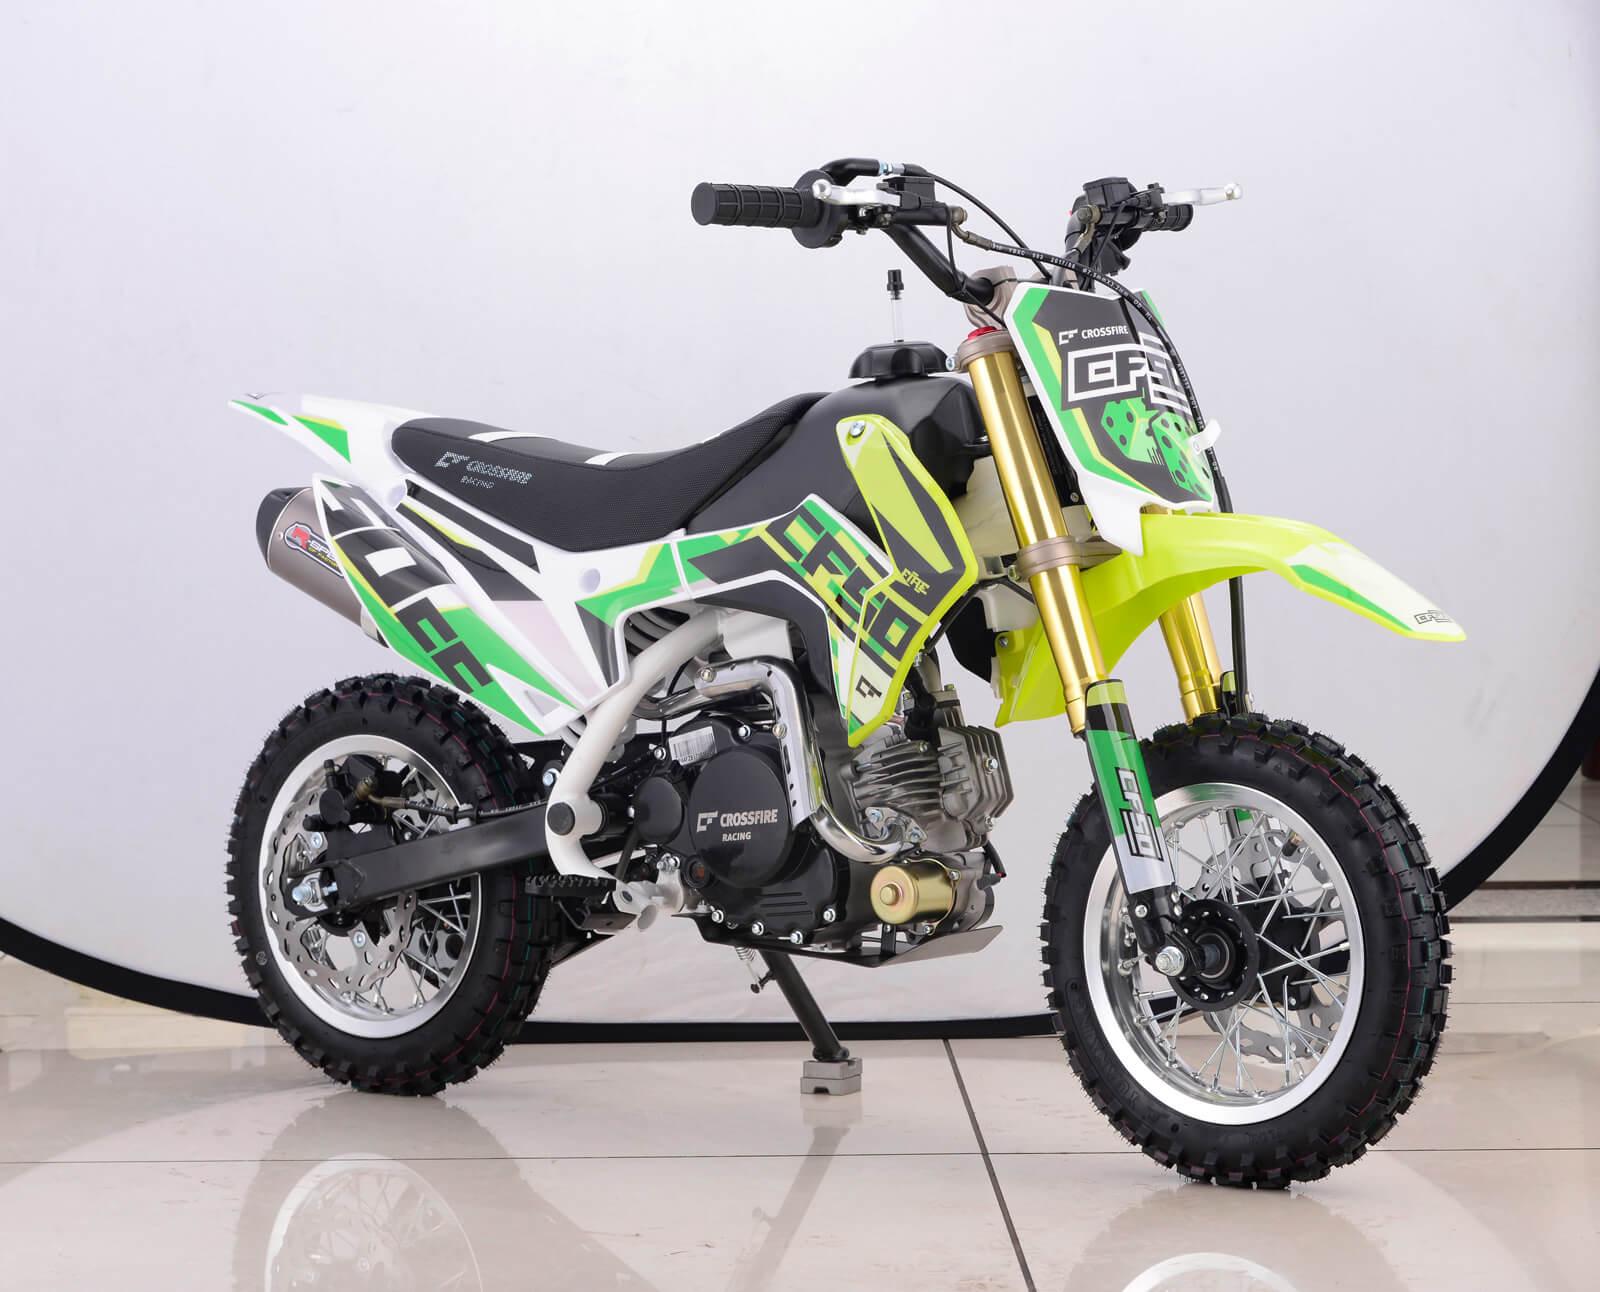 Crossfire Motorcycles - CF110 110cc Dirt Bike